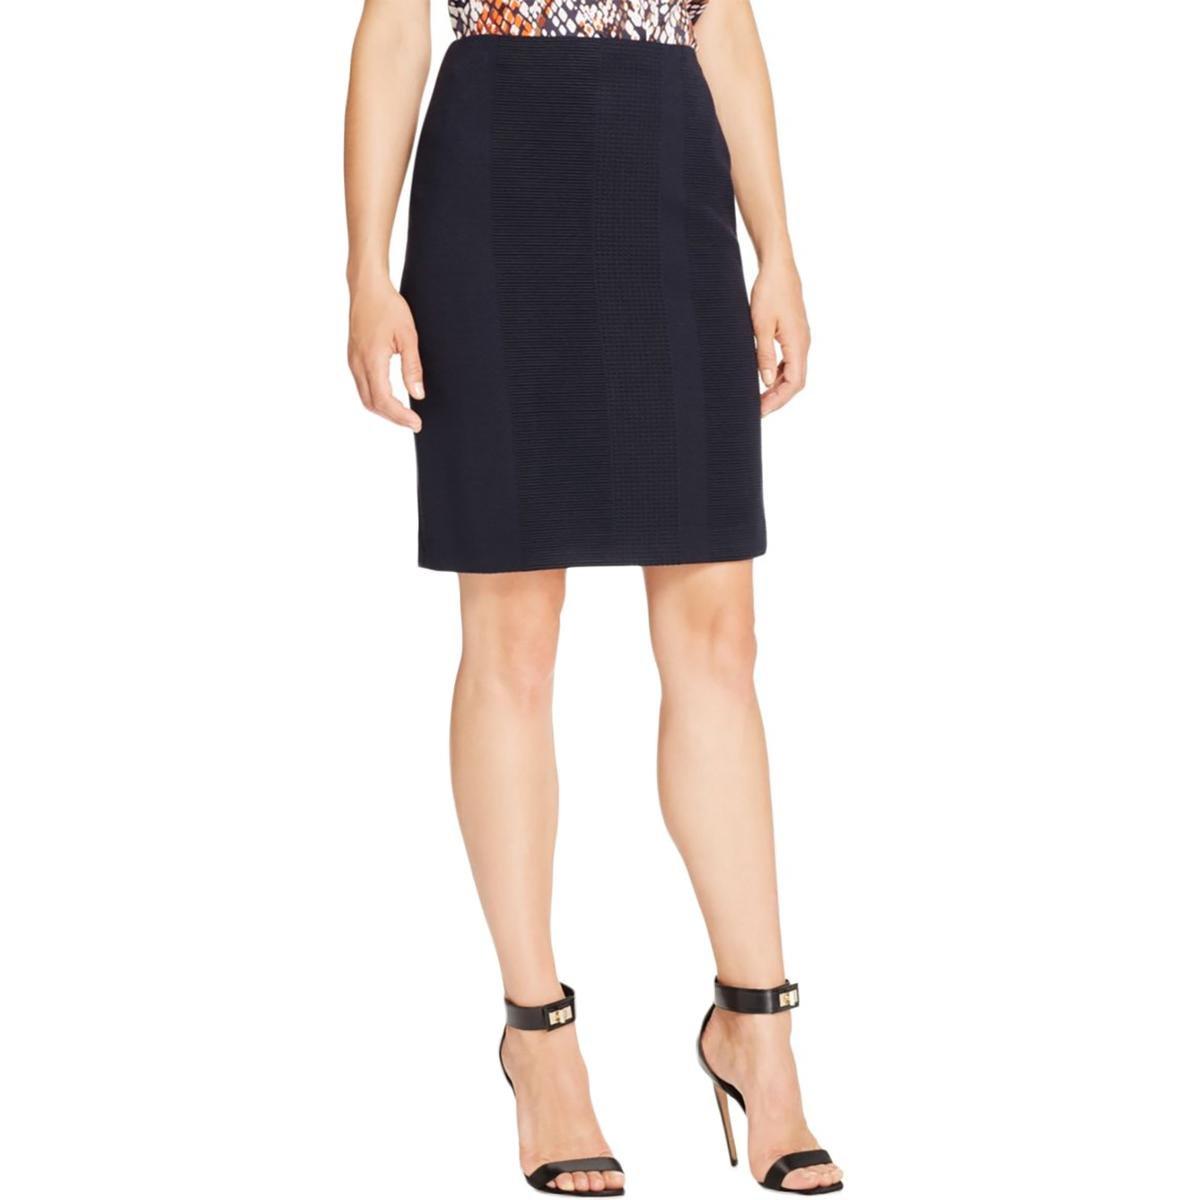 Hugo Boss Womens Meralina Textured Knee-Length Pencil Skirt Navy 14